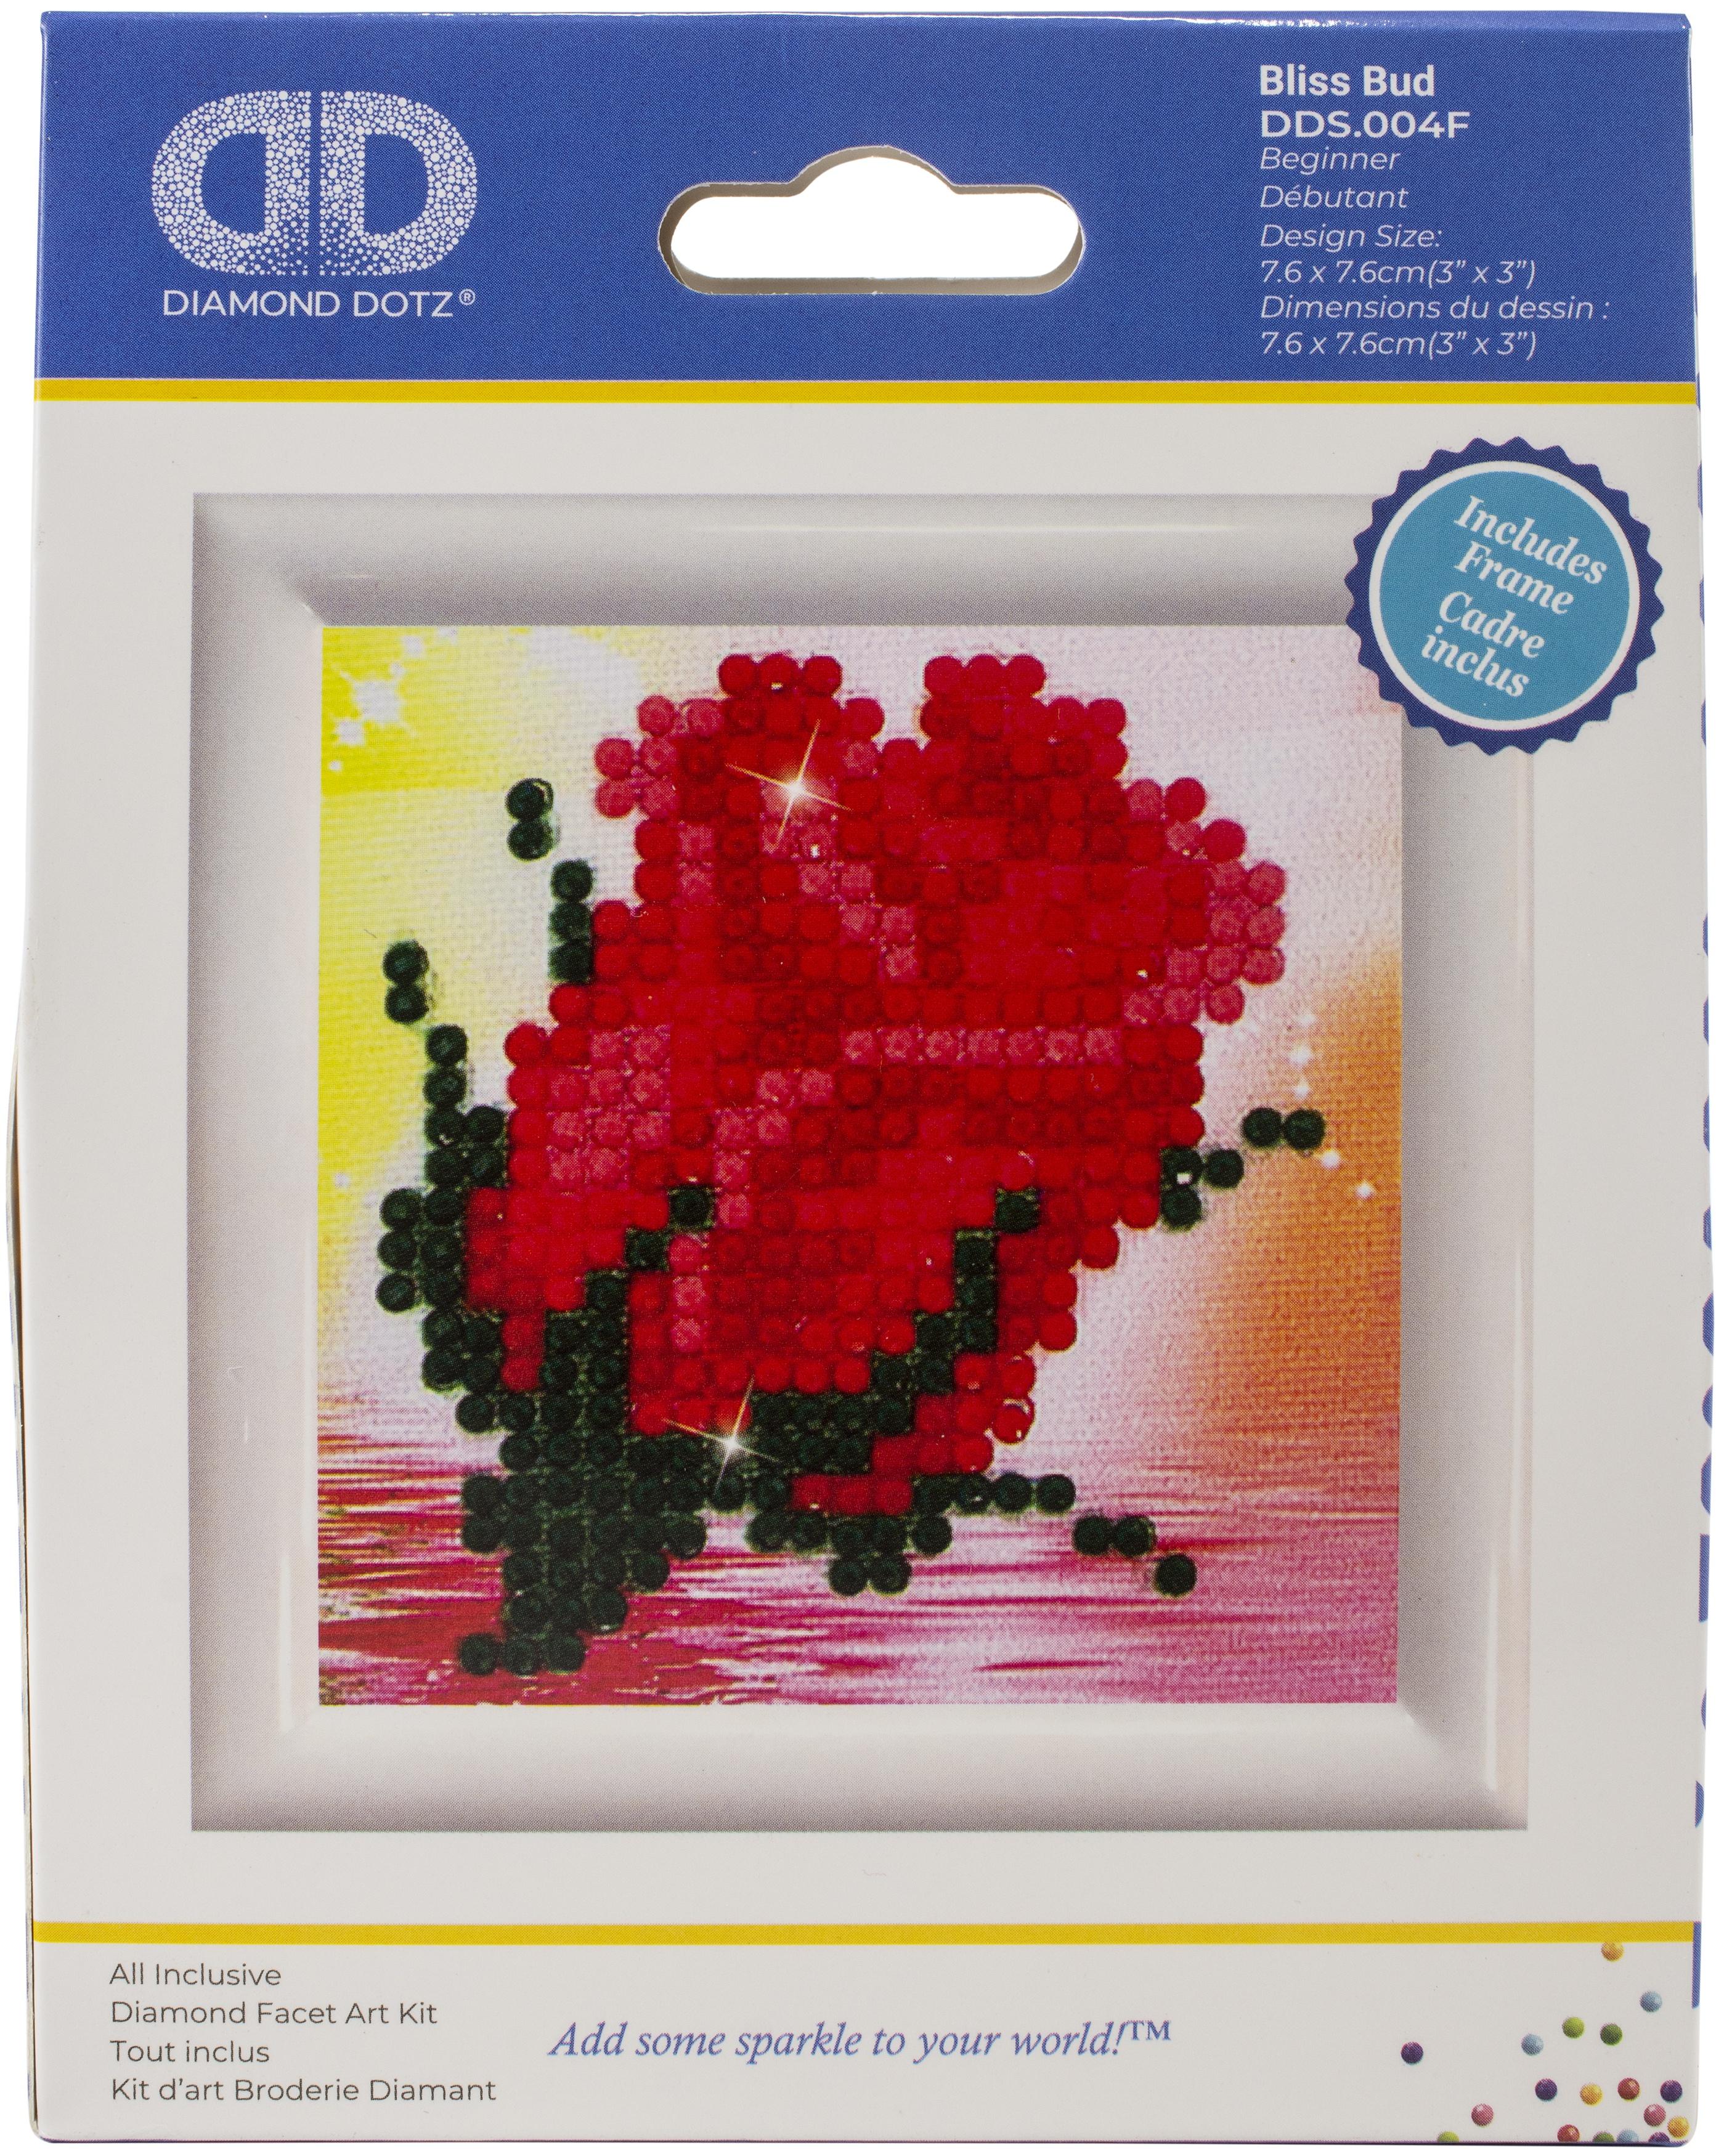 Diamond Dotz Diamond Embroidery Facet Art Kit W/ Frame-Bliss Bud W/ White Frame